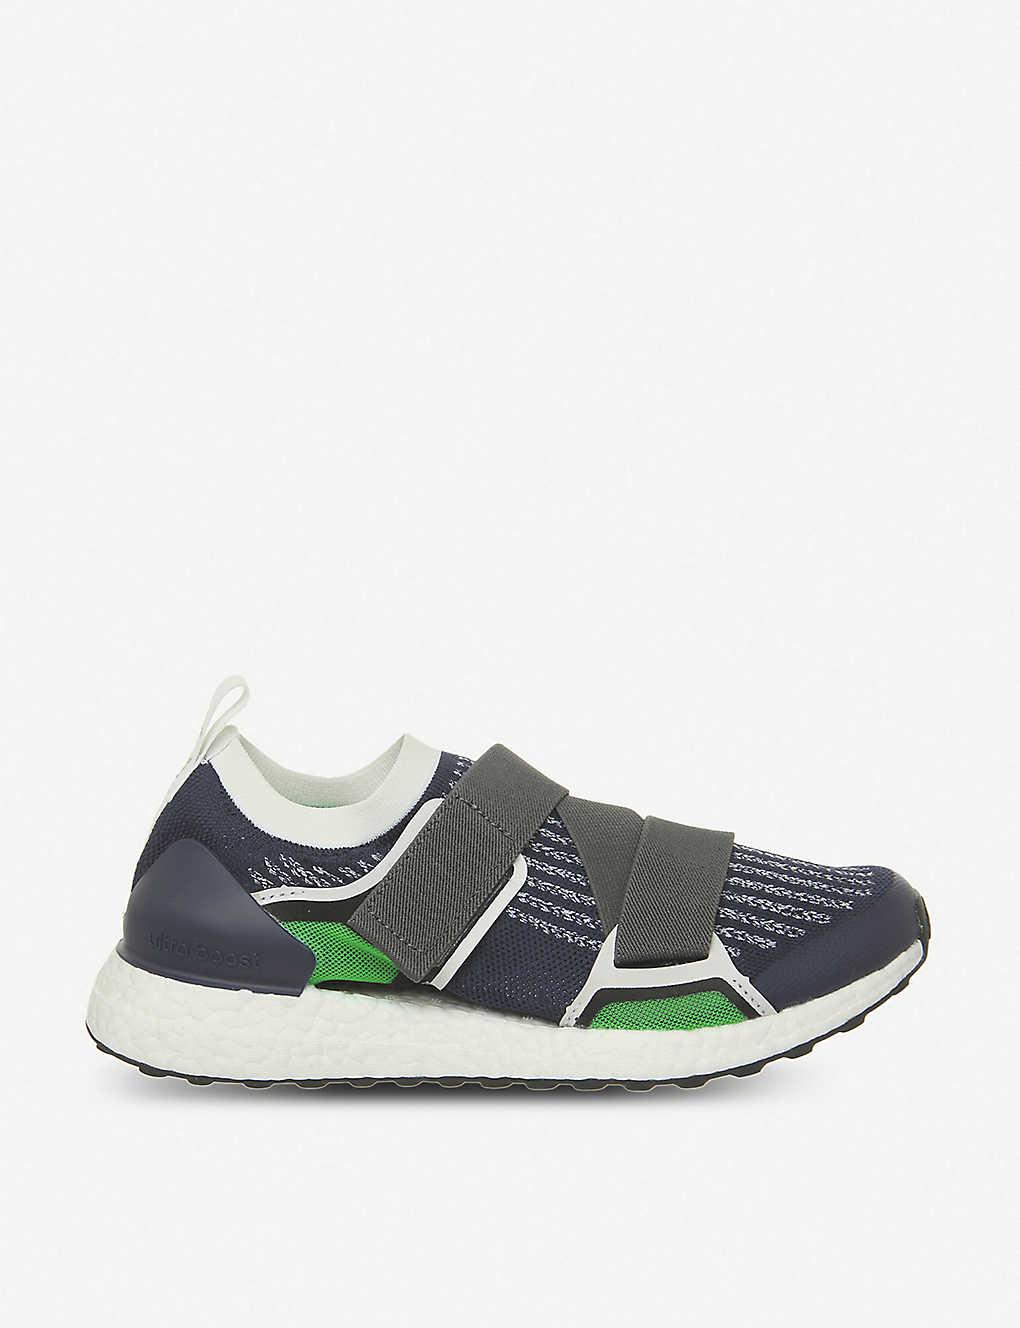 93df72882cd ... adidas by Stella McCartney Ultraboost X Primeknit trainers - Night  indigo granite ...